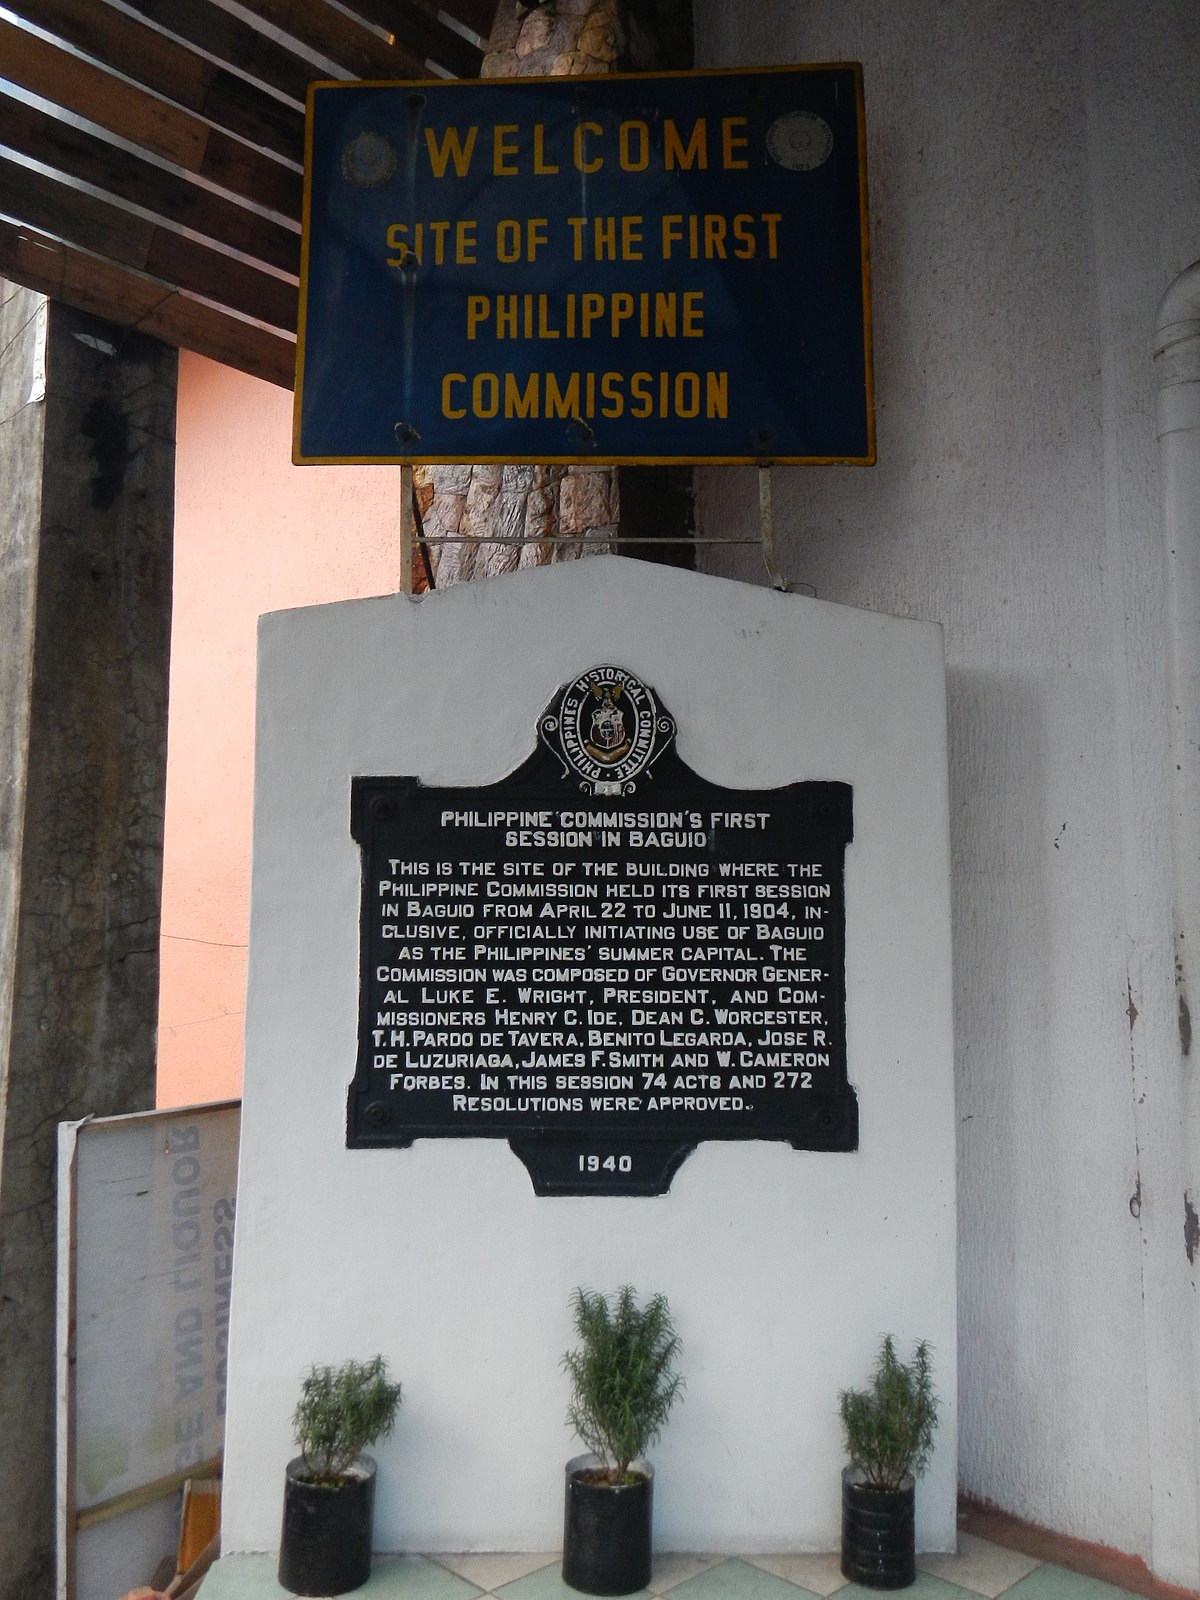 Philippine Commission Wikipedia